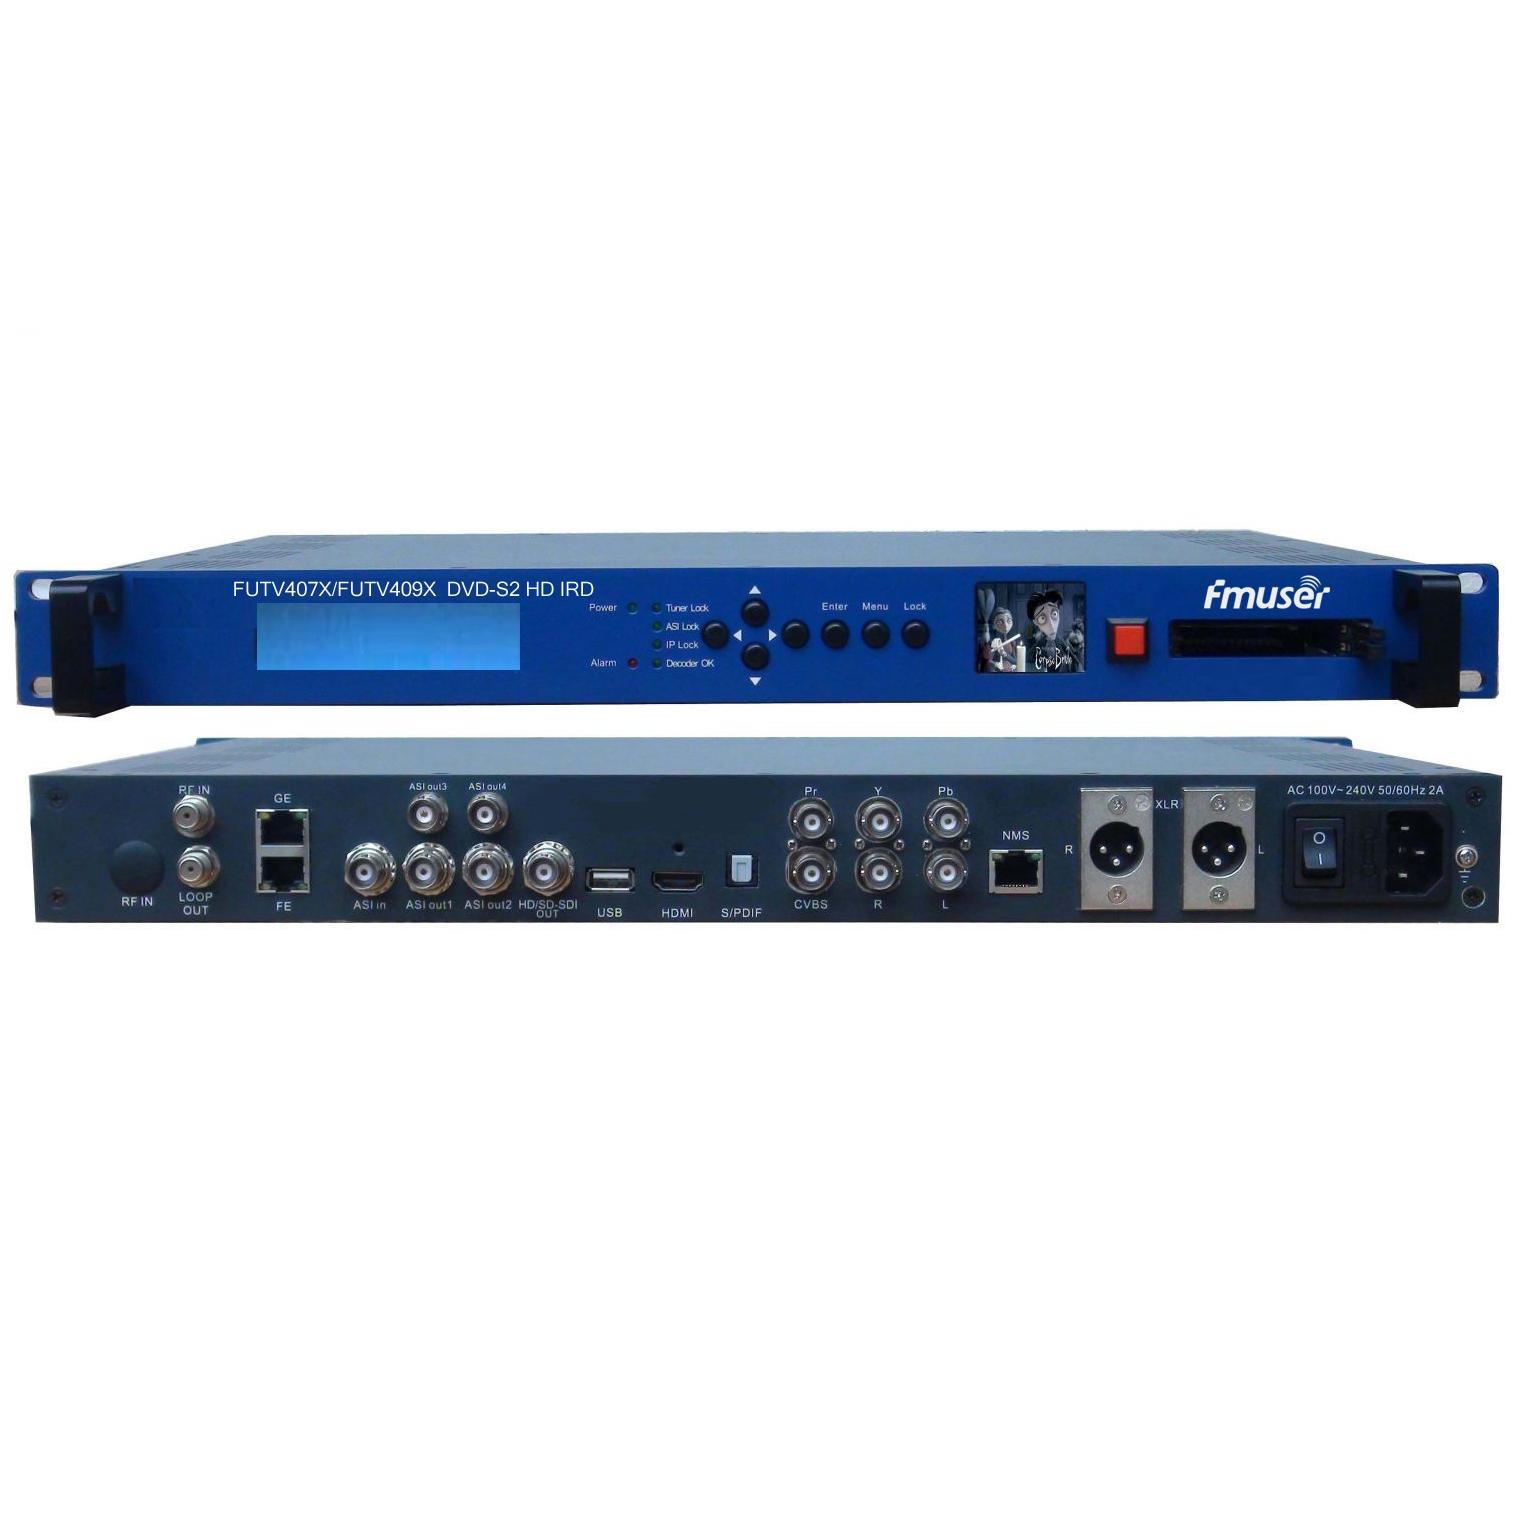 FMUSER FUTV409X / FUTV407X CAM IRD (1 DVB-C / T / S / S2, DMB-T, ISDB-T, ATSC-T 8VSB RF вход, 1 ASI IP вход, 2 ASI 1 IP изход, HDMI SDI изход, HDMI SDI изход) с екран на живо